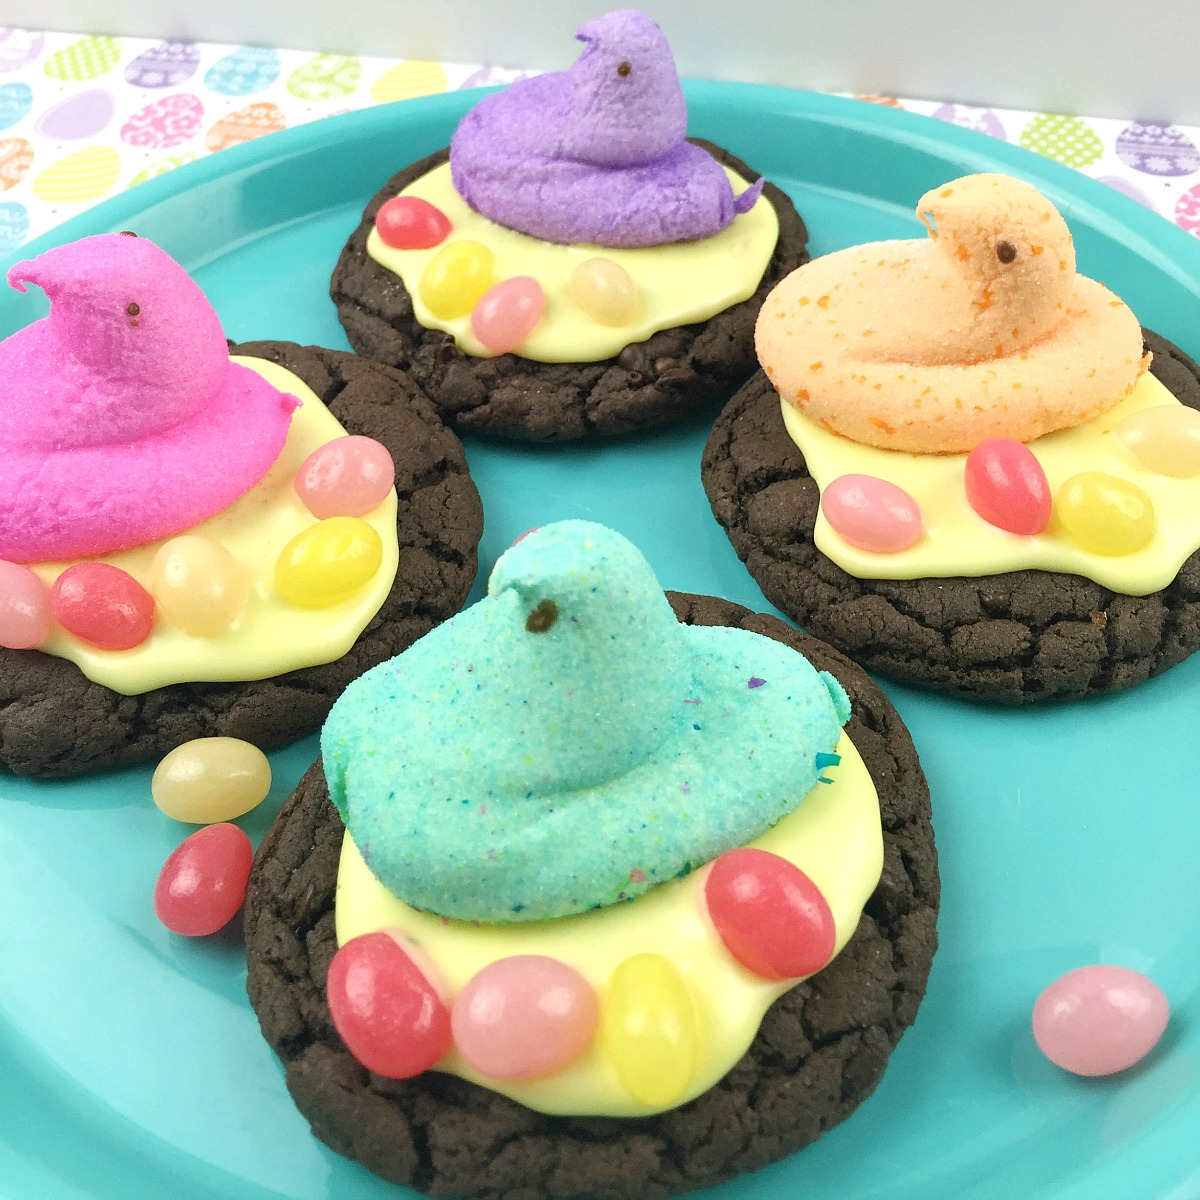 Marshmallow Peep Chocolate Easter Cookies from 5DollarDinners.com